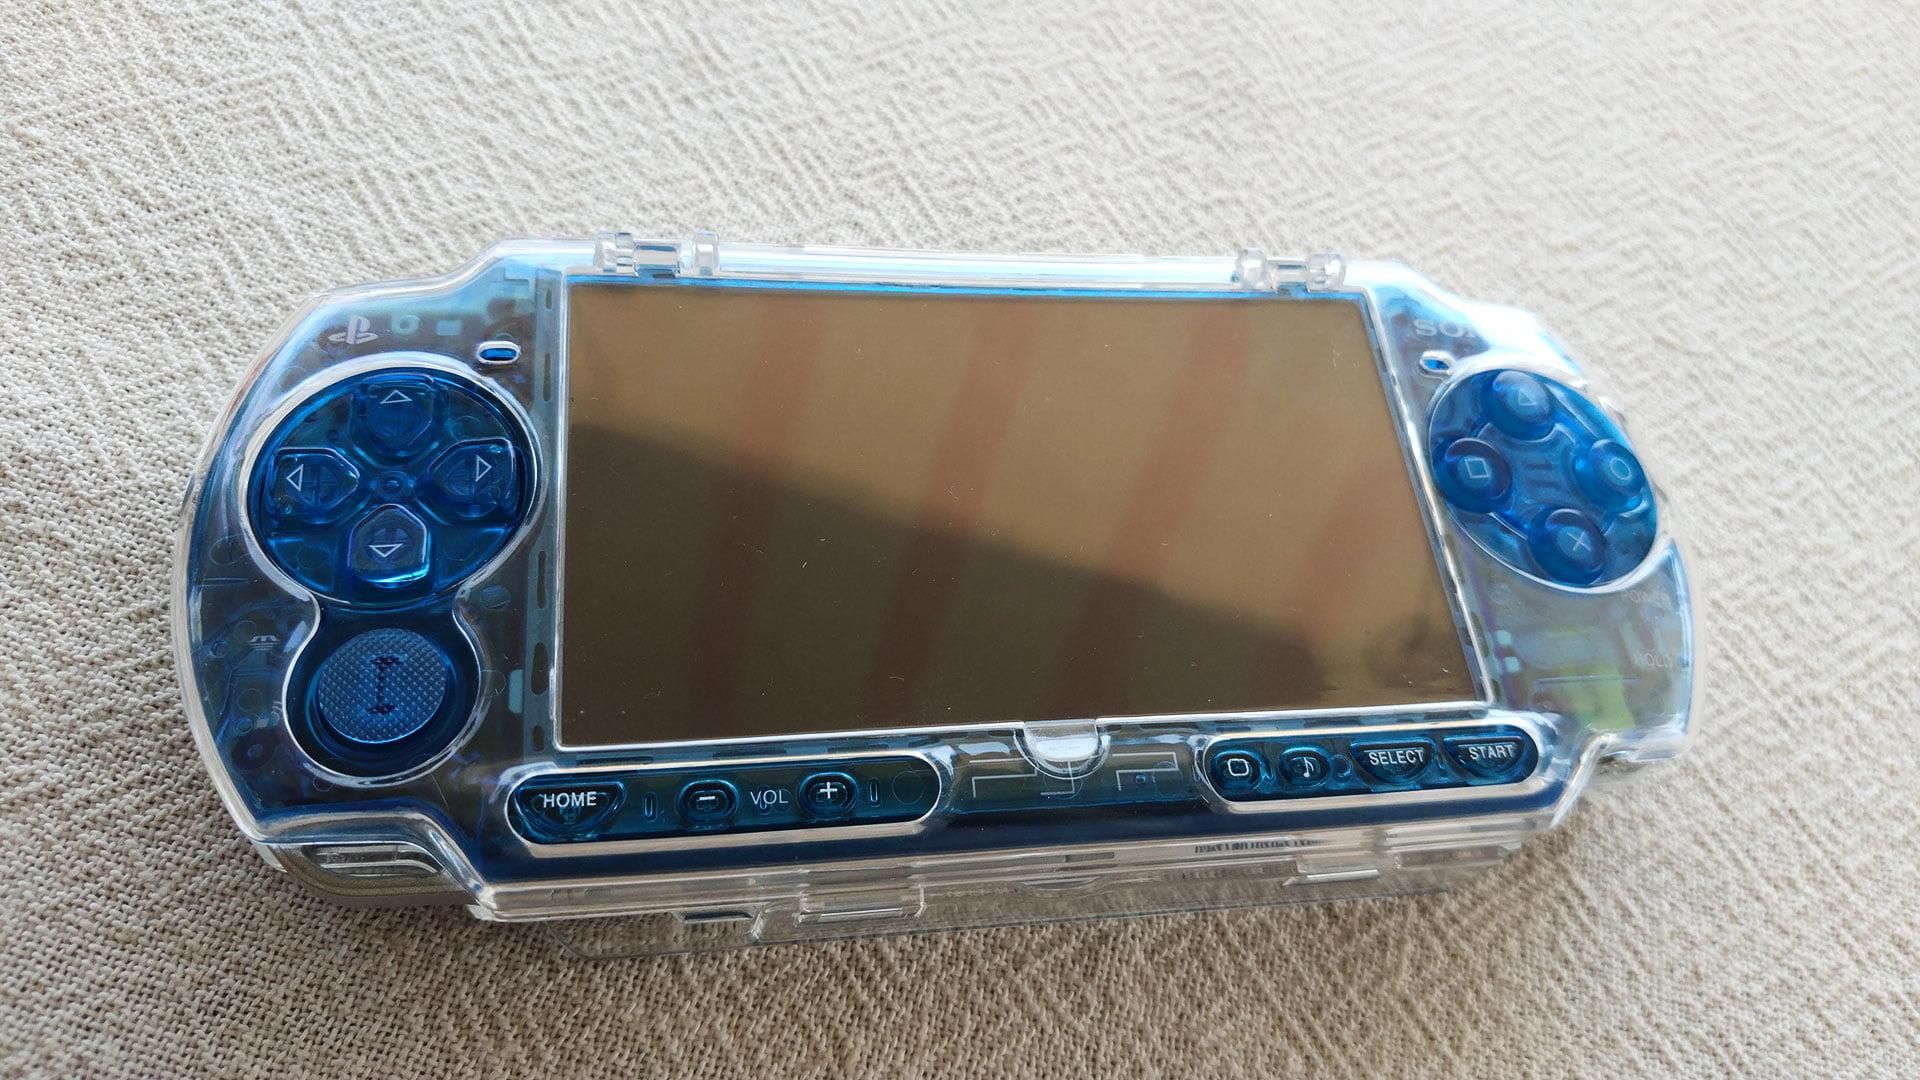 Sony PSP (PlayStation Portable)